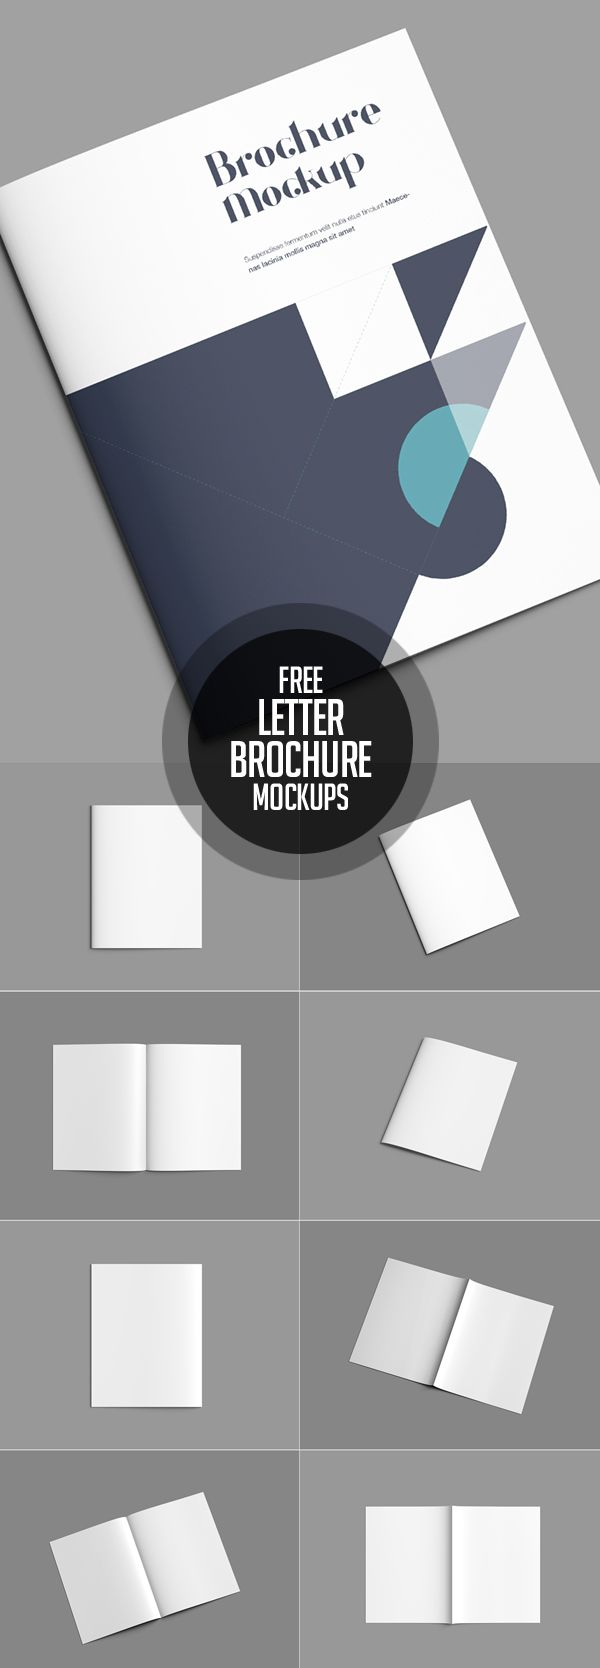 Free Letter Brochure Mockup PSD #freepsdfiles #freepsdmockups #freebies #psdmockups